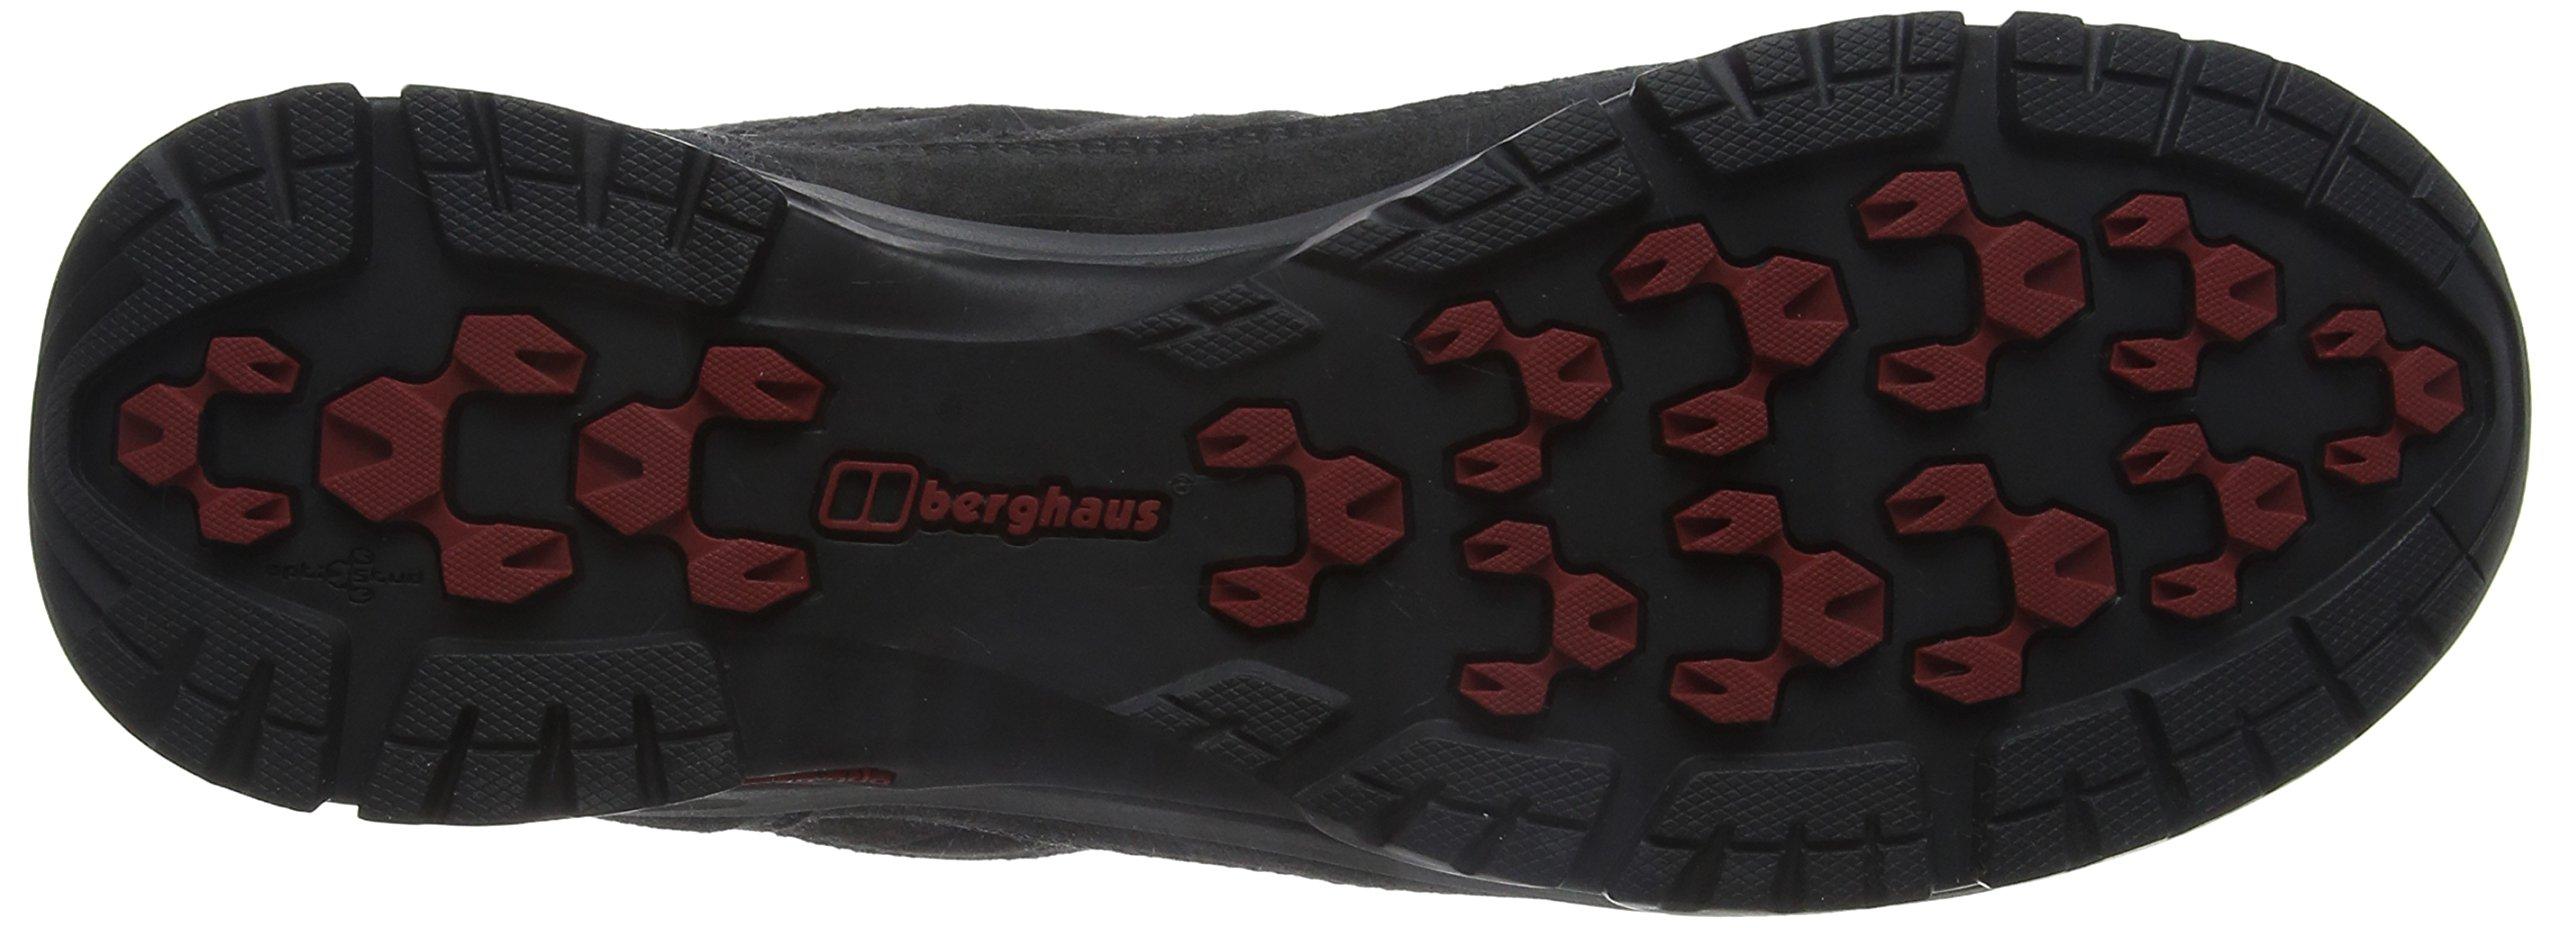 Berghaus Men's Expeditor Active AQ Tech Shoes 3